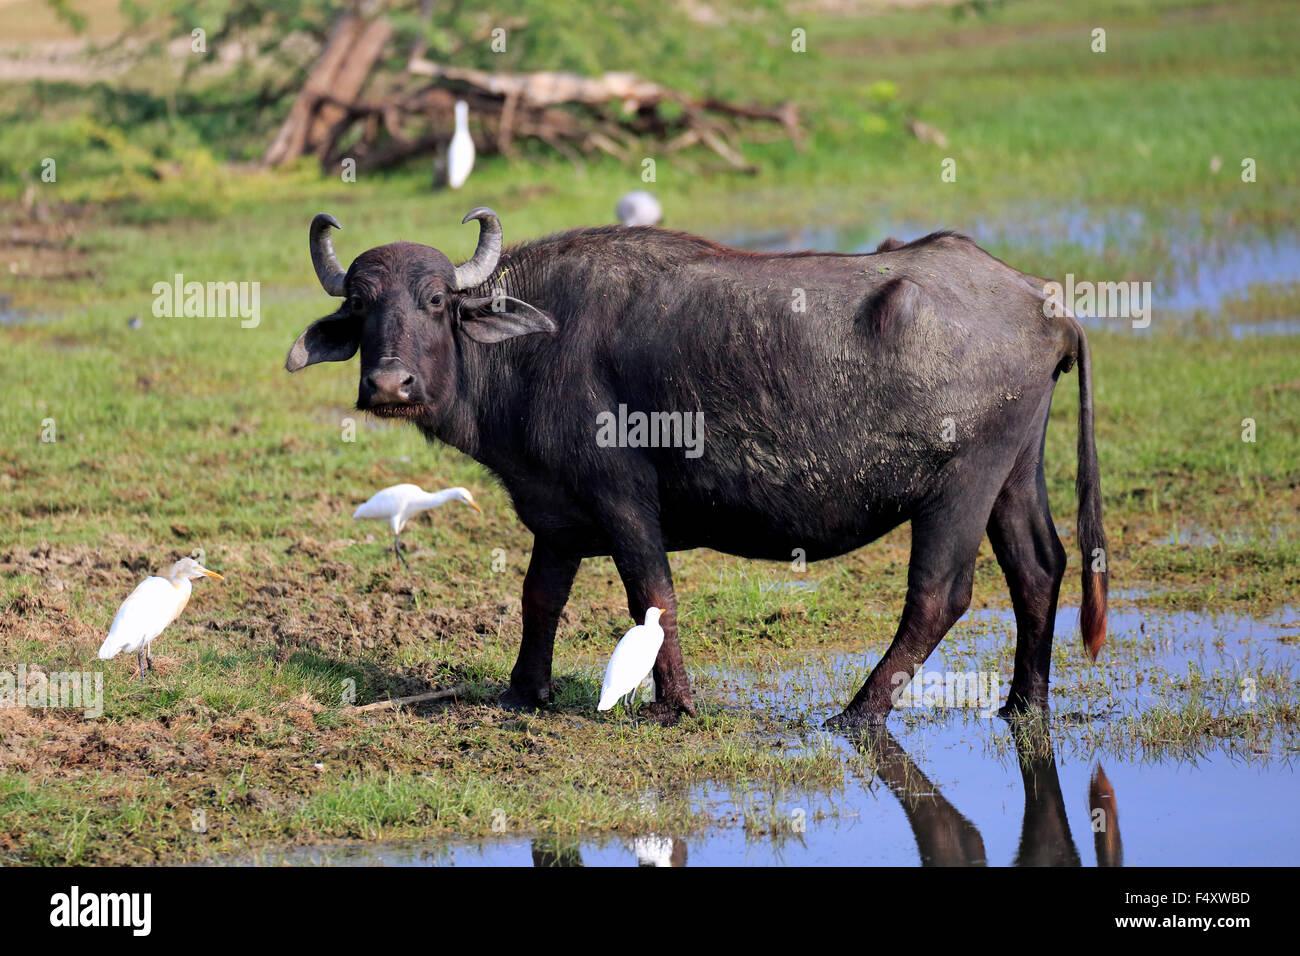 Búfalo de agua (Bubalis bubalis), adultos en aguas poco profundas con la garcilla bueyera (Bubulcus ibis), Parque Nacional Bundala, Sri Lanka Foto de stock